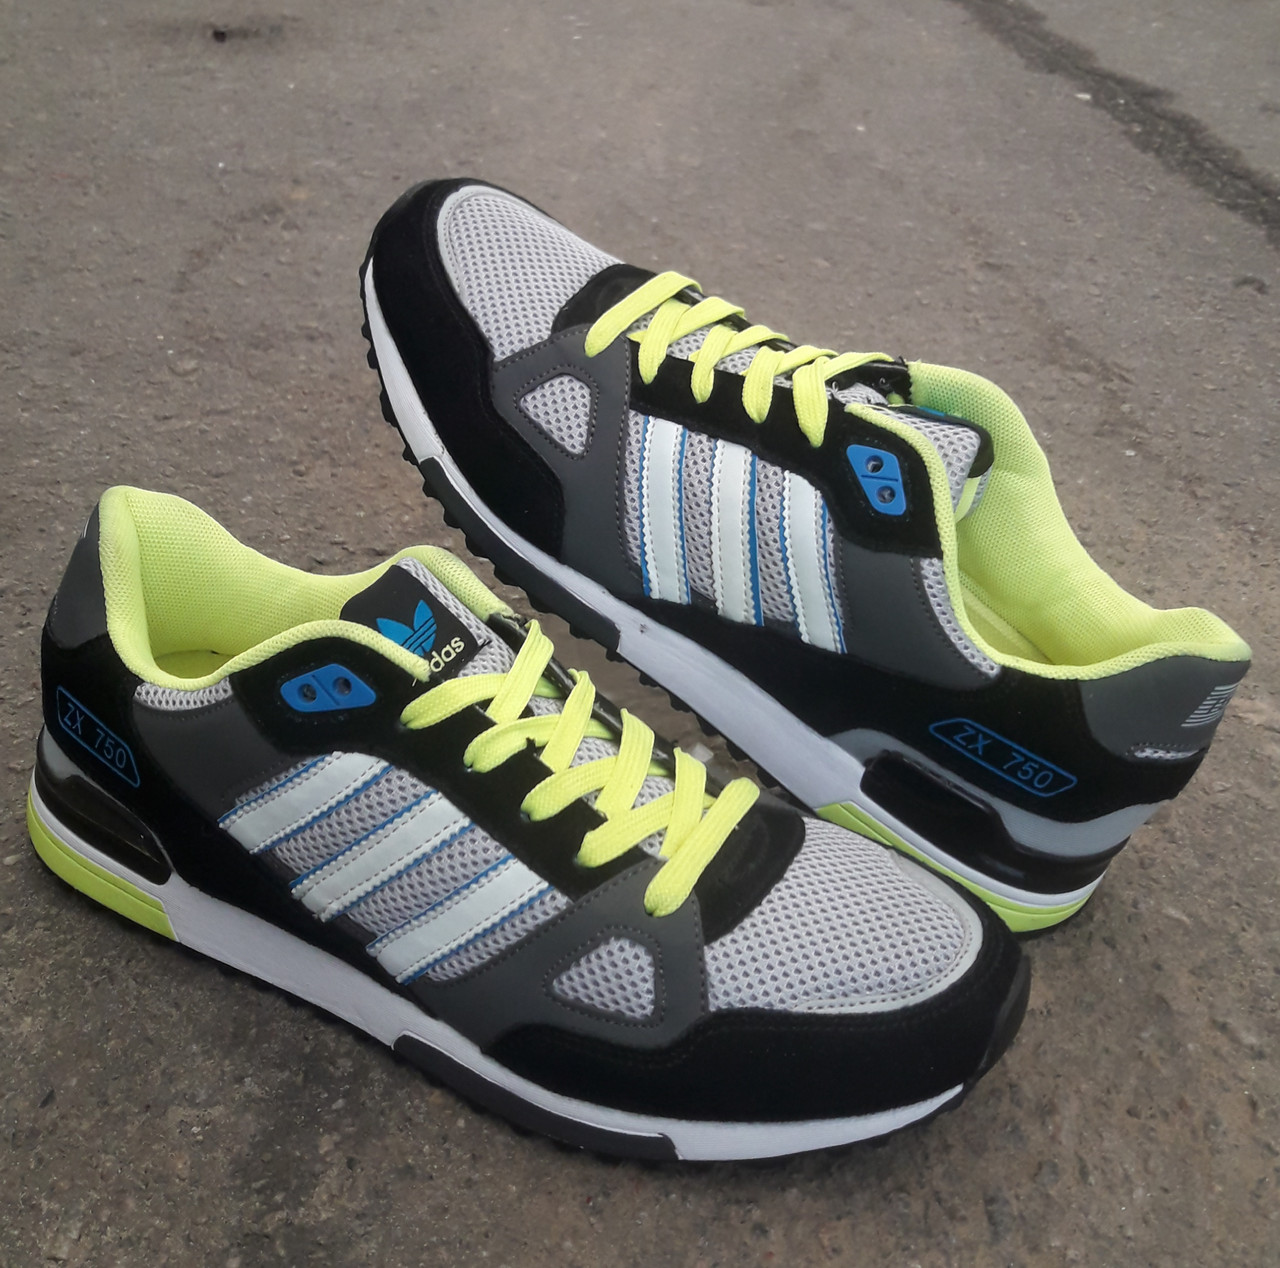 Кросівки Adidas ZX 750 р. 44